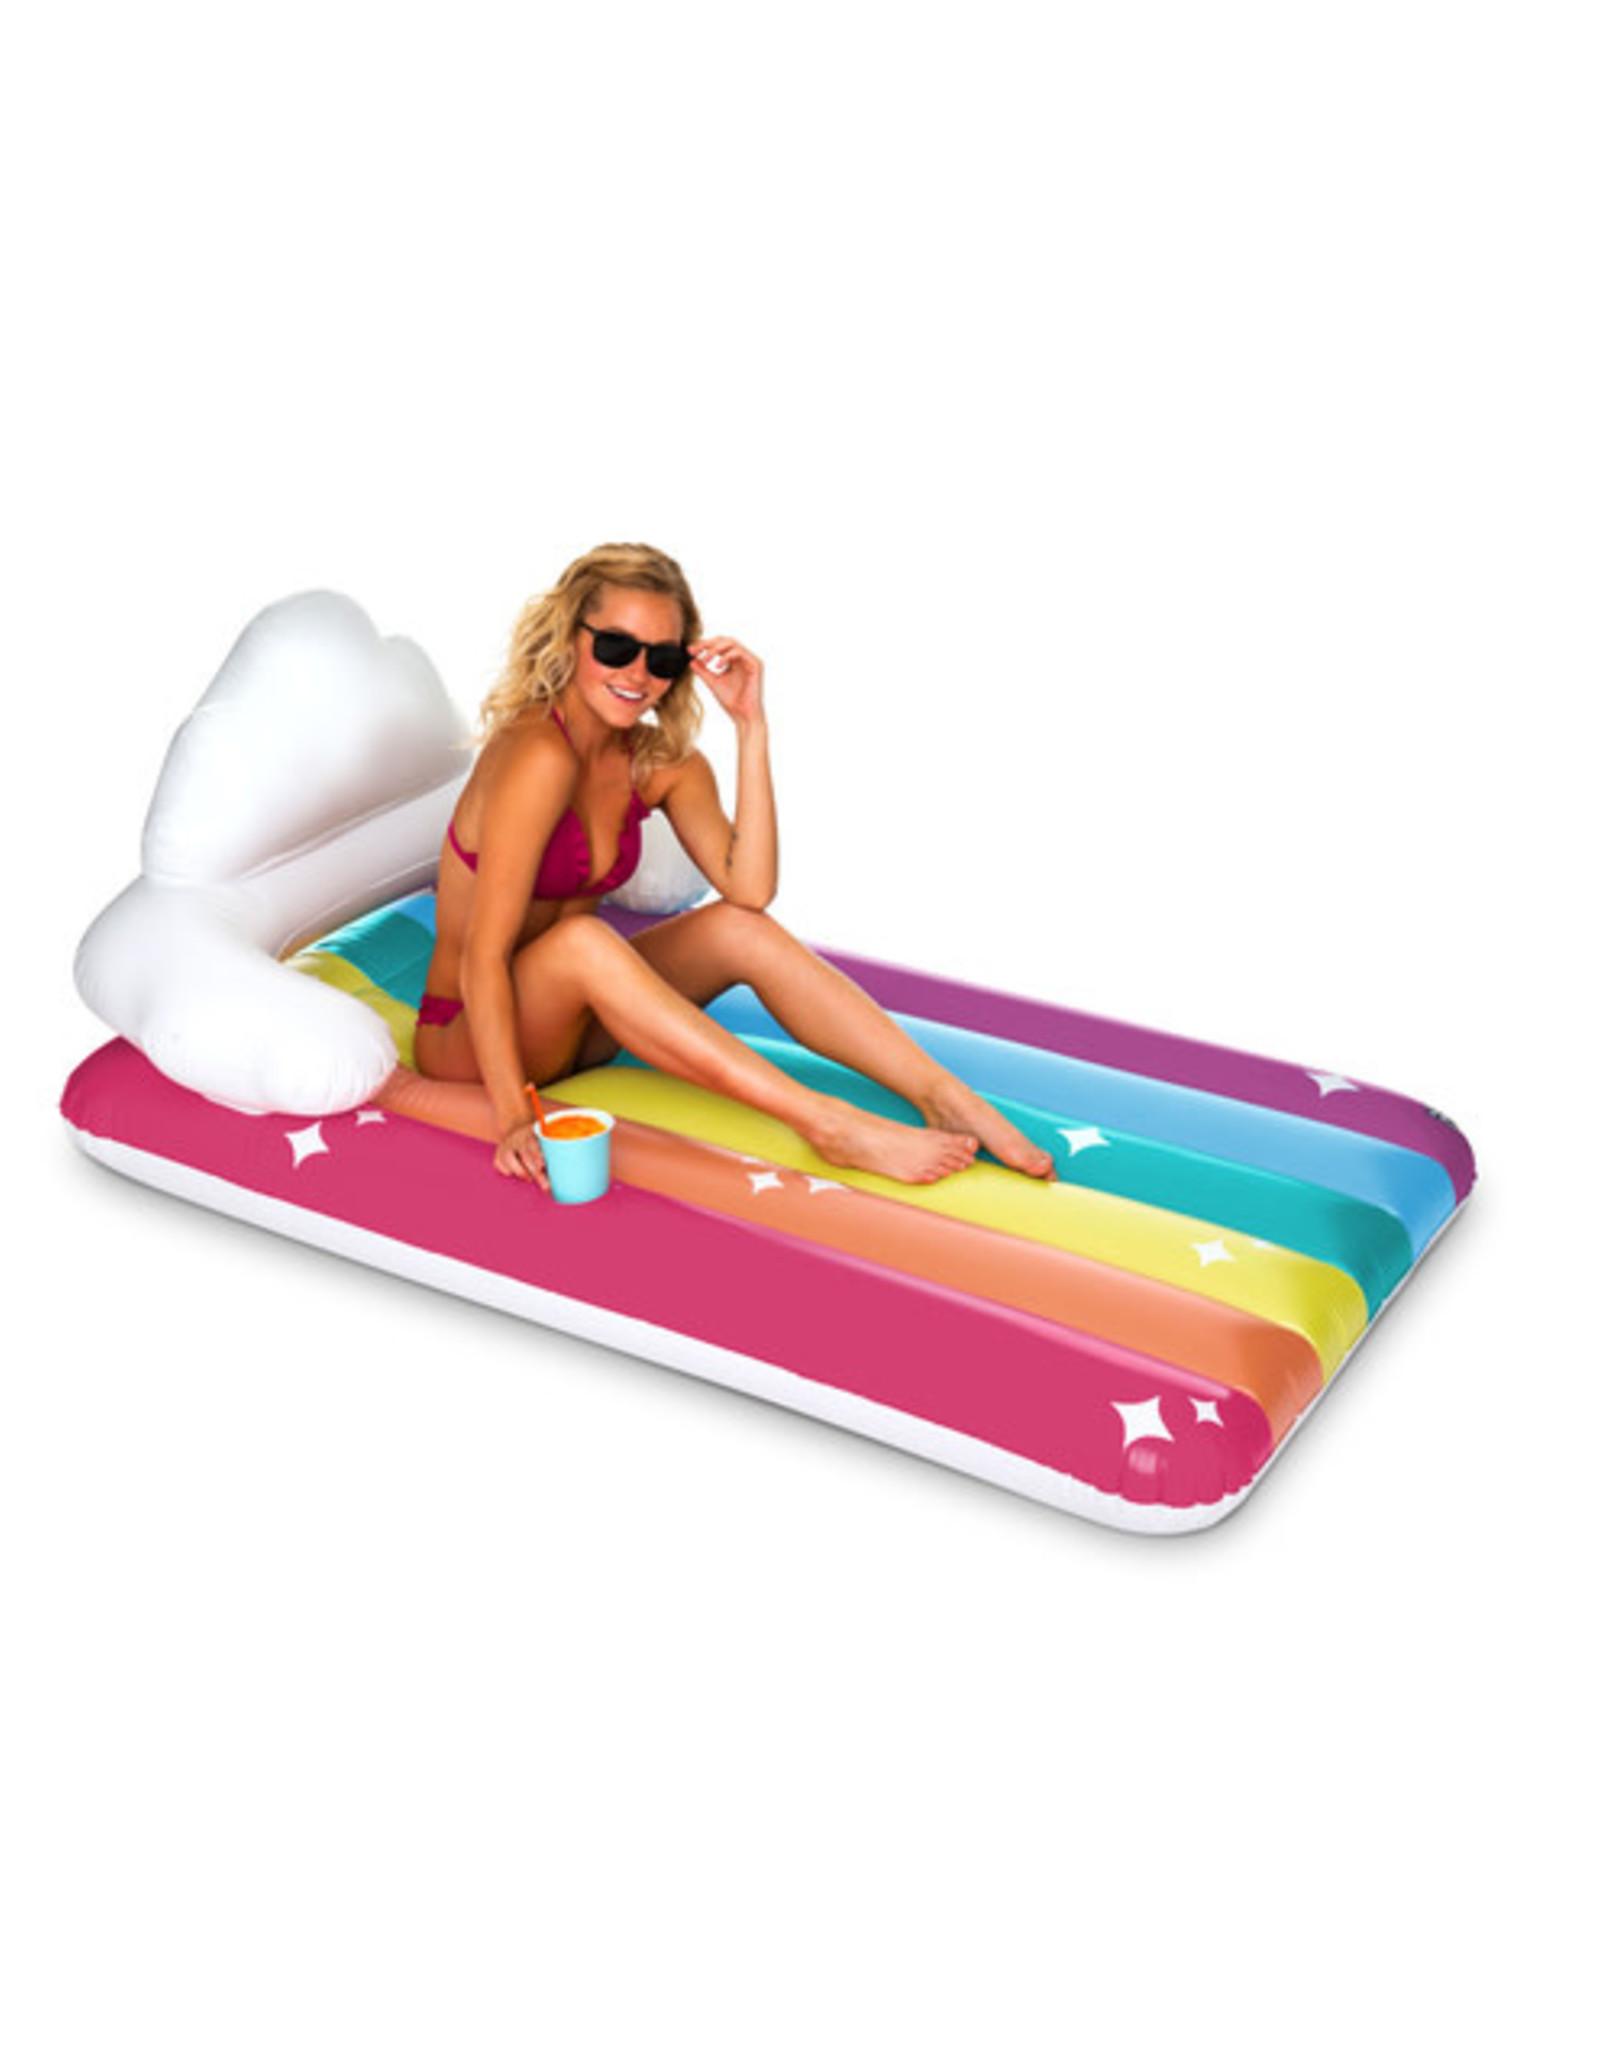 BigMouth Pool Float - Rainbow Clouds Mattress